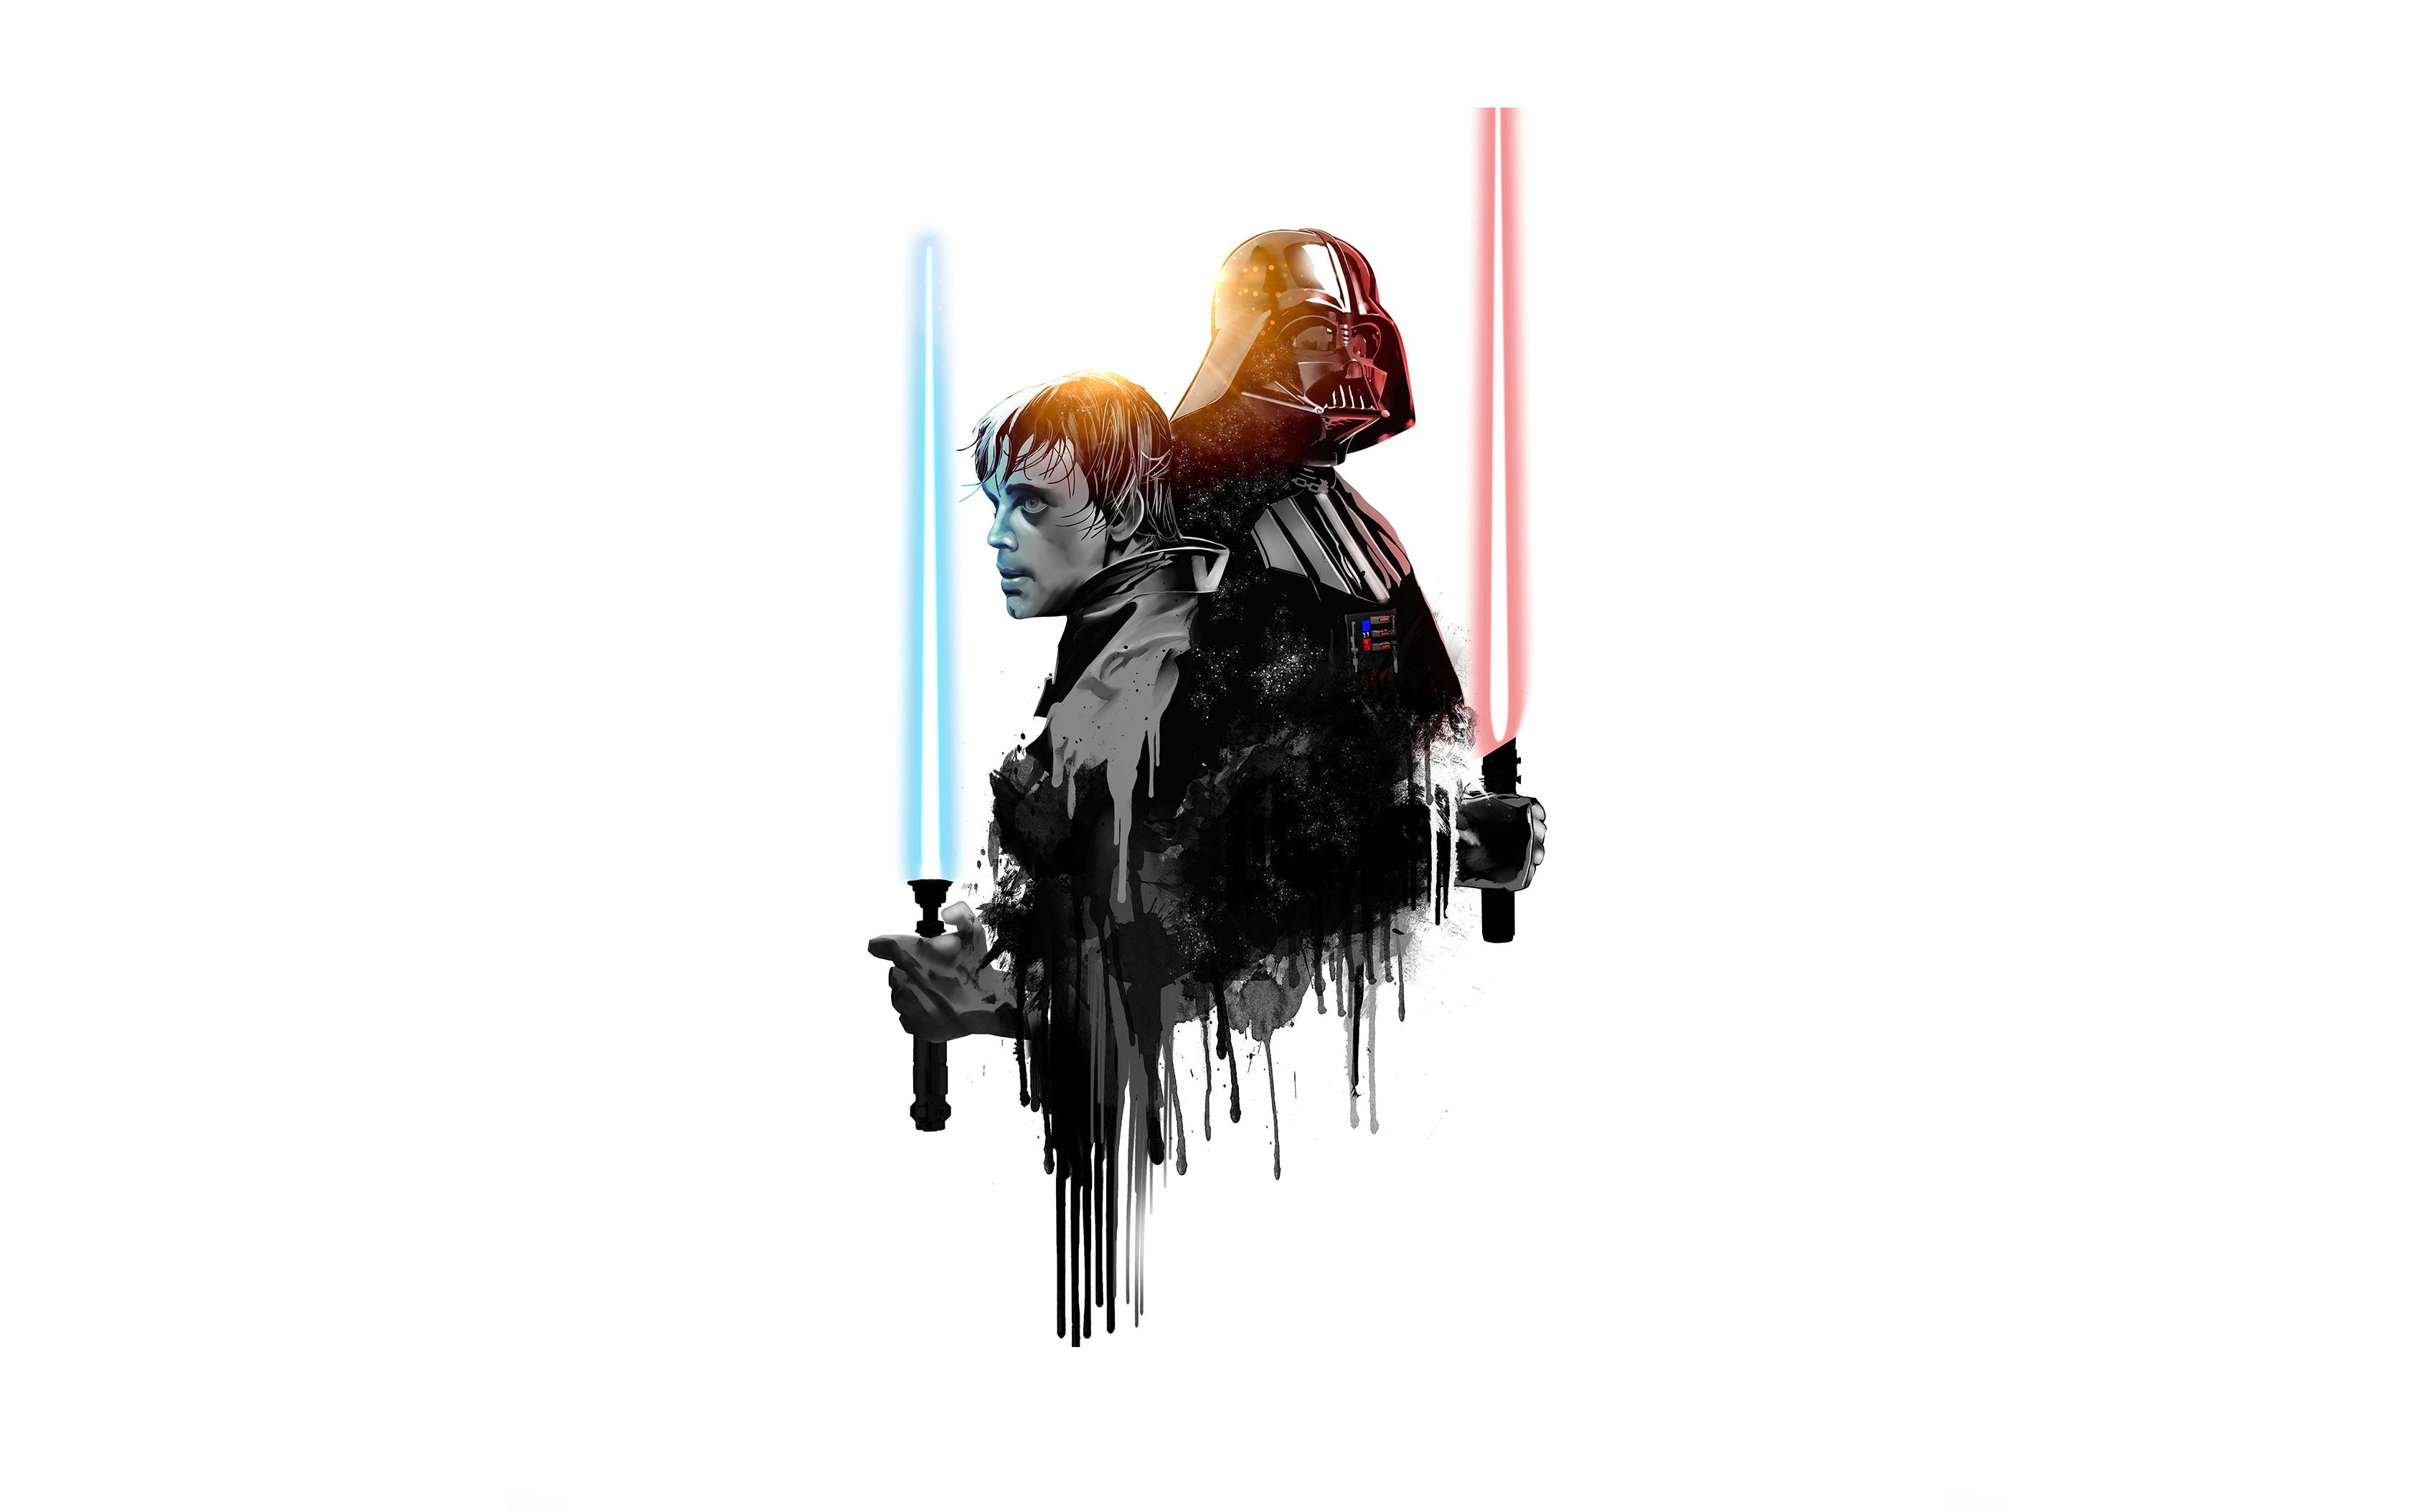 Darth Vader Lightsaber Luke Skywalker Minimalist Star Wars Wallpaper 3365x2108 1232062 Wallpaperup